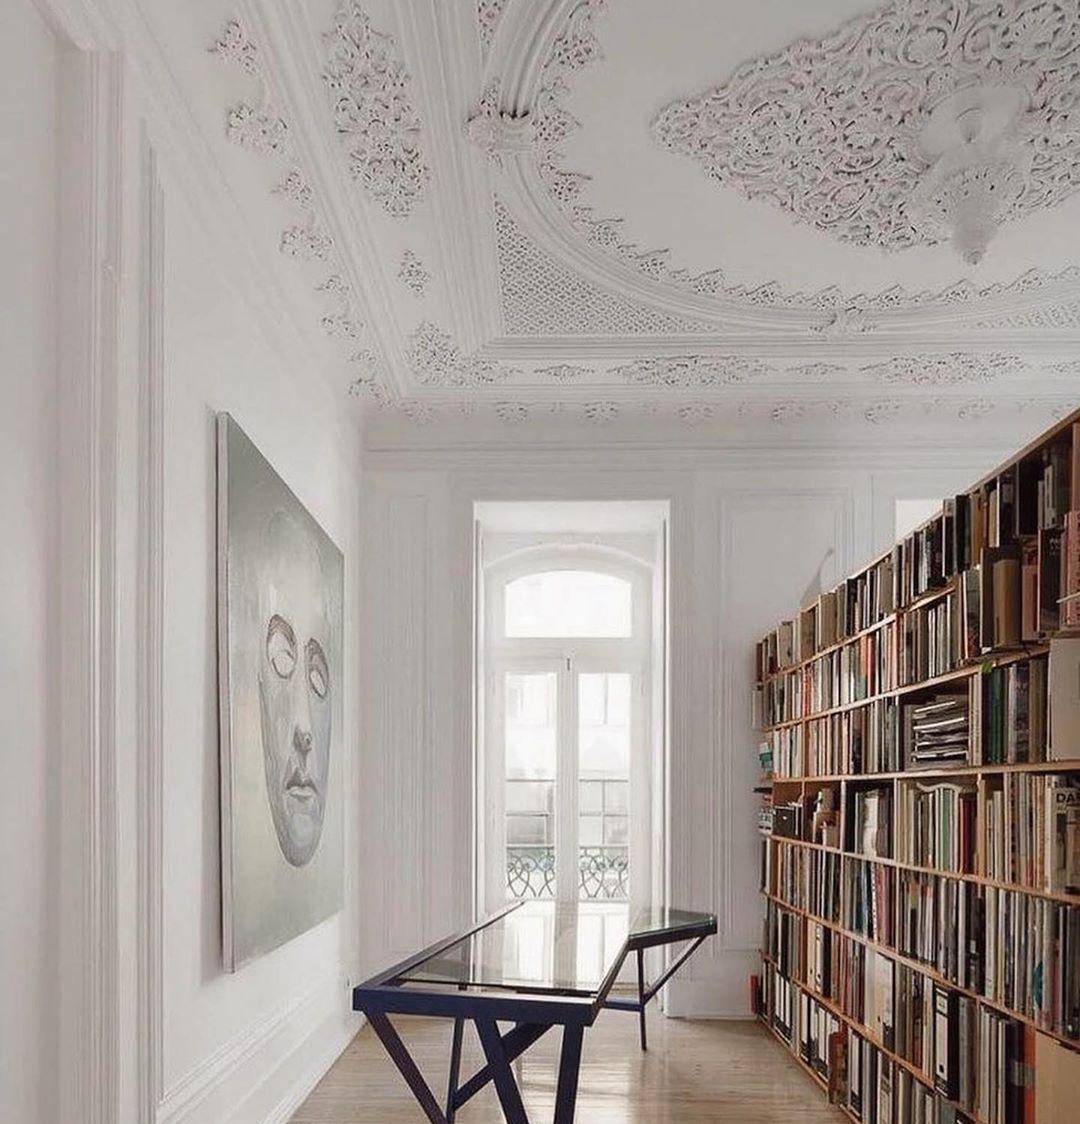 "M O D U  Studio on Instagram: ""That ceiling...🤍 Via @maandpartners #ceilingdesign #librariesofinstagram #officedecor"""